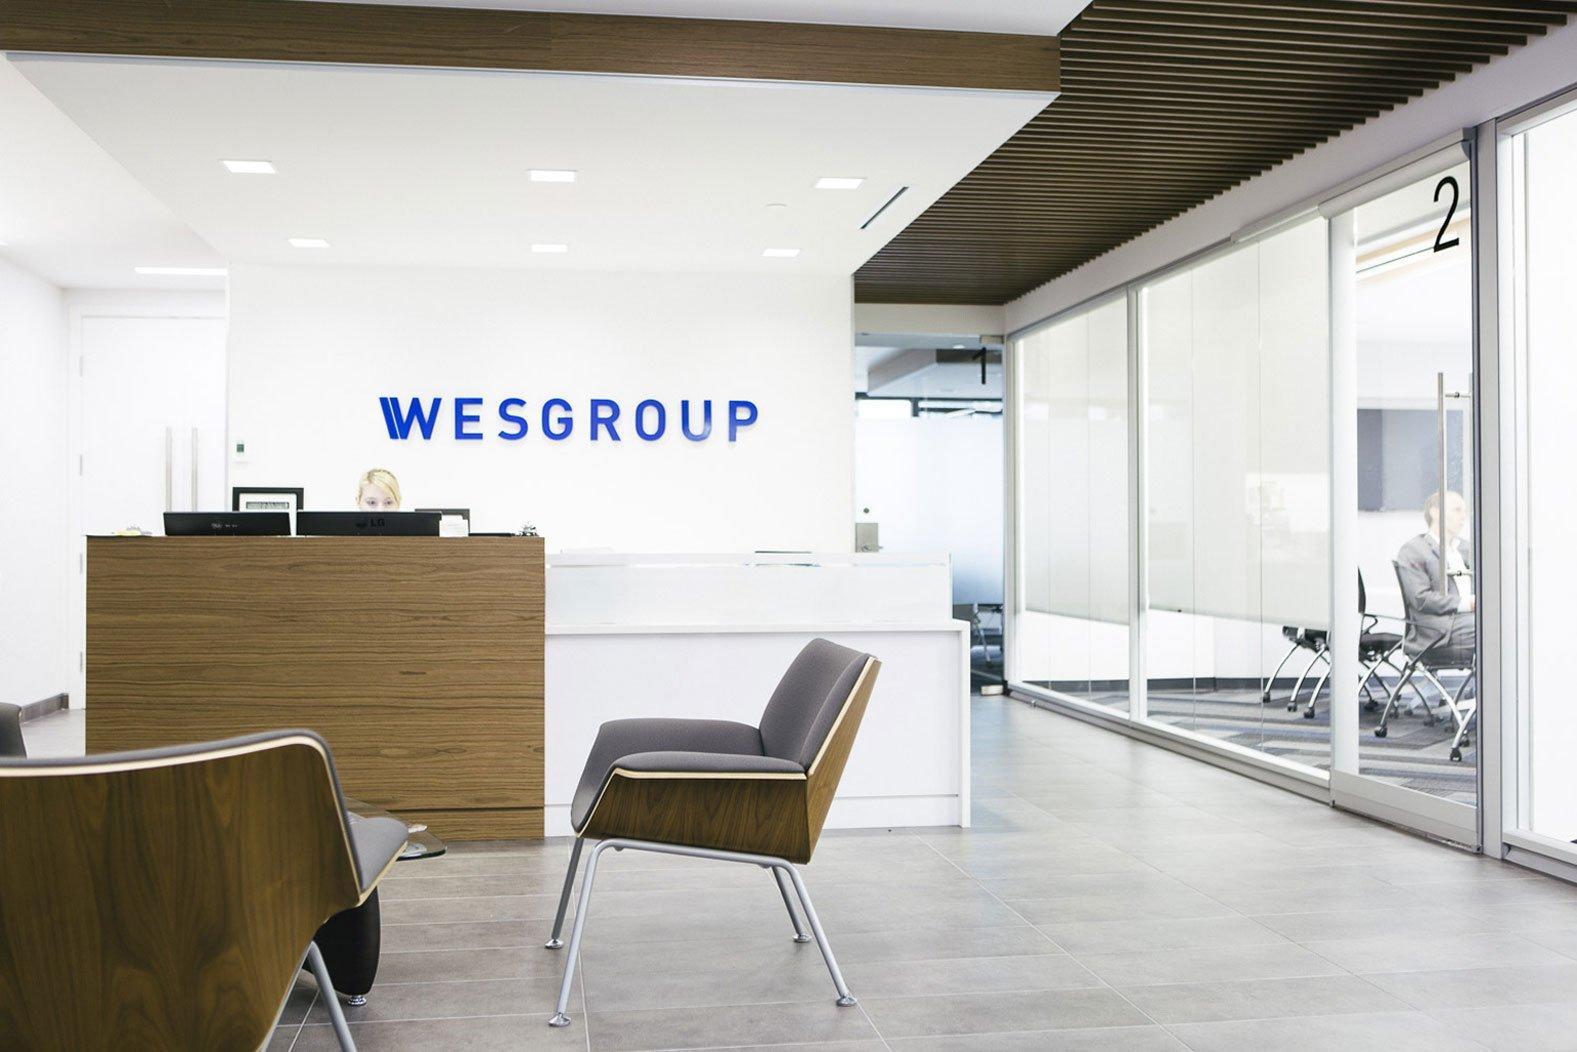 Westgroup company